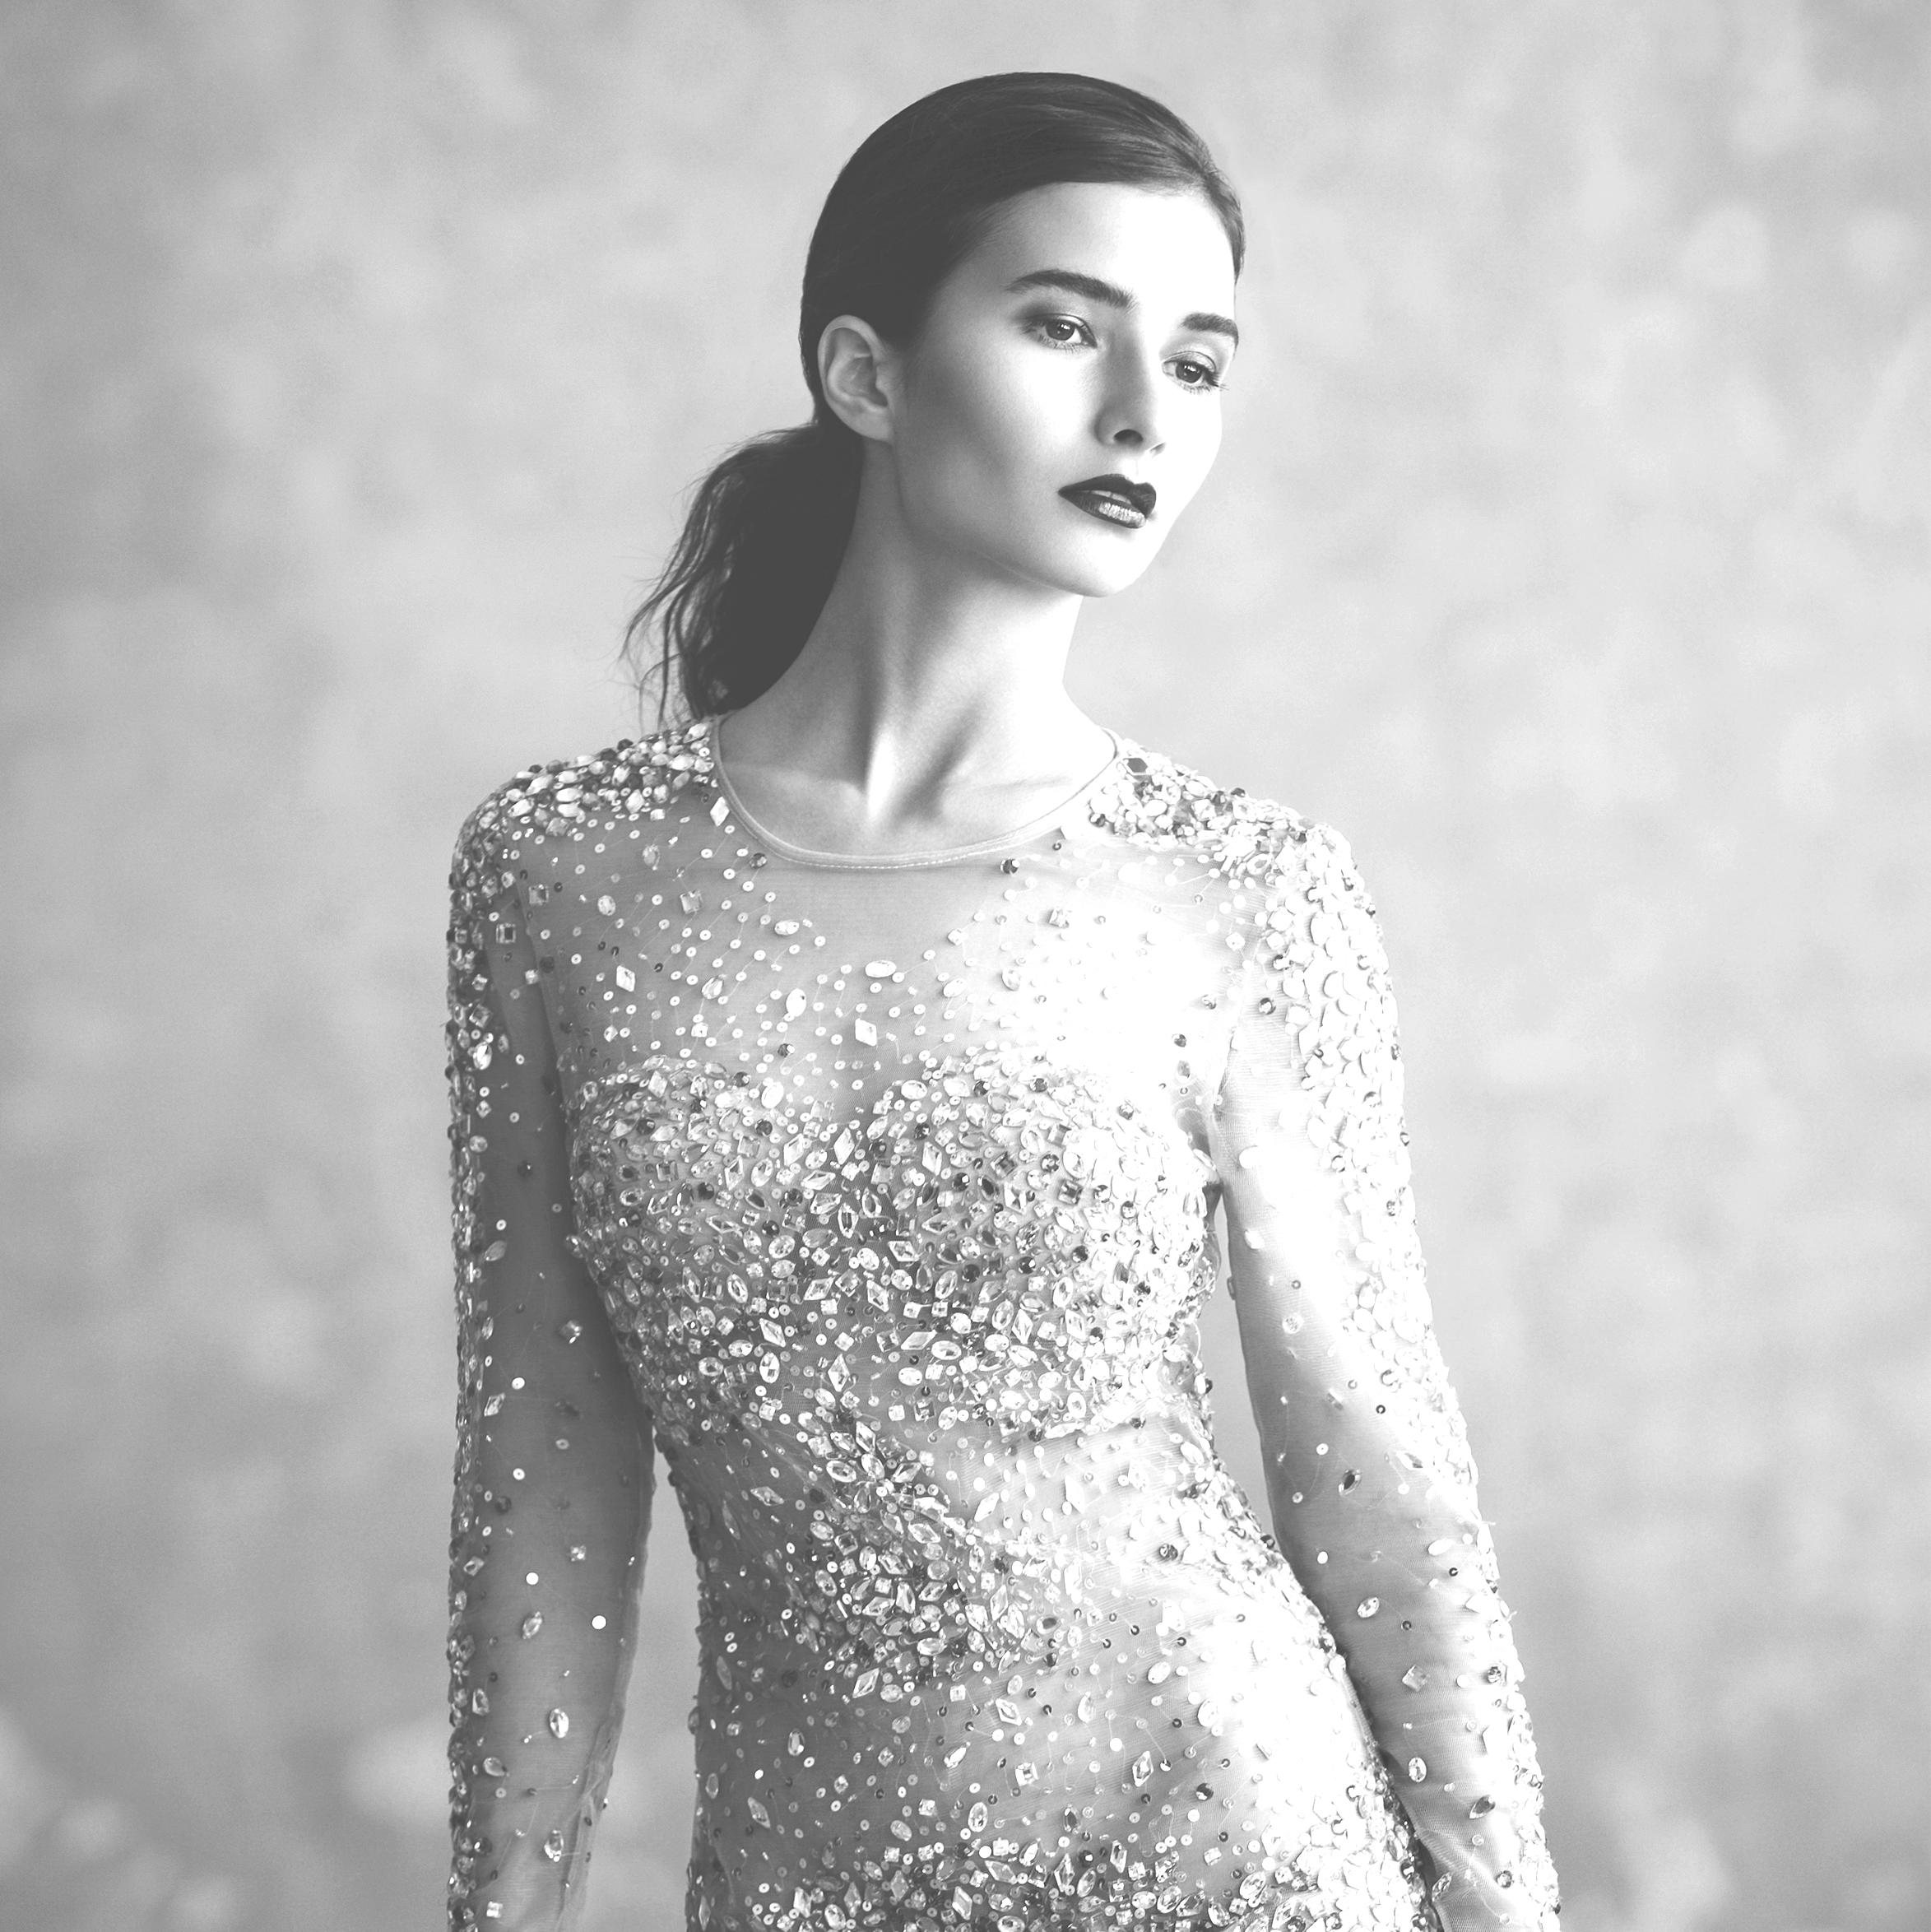 Sequin_dress_new.jpg